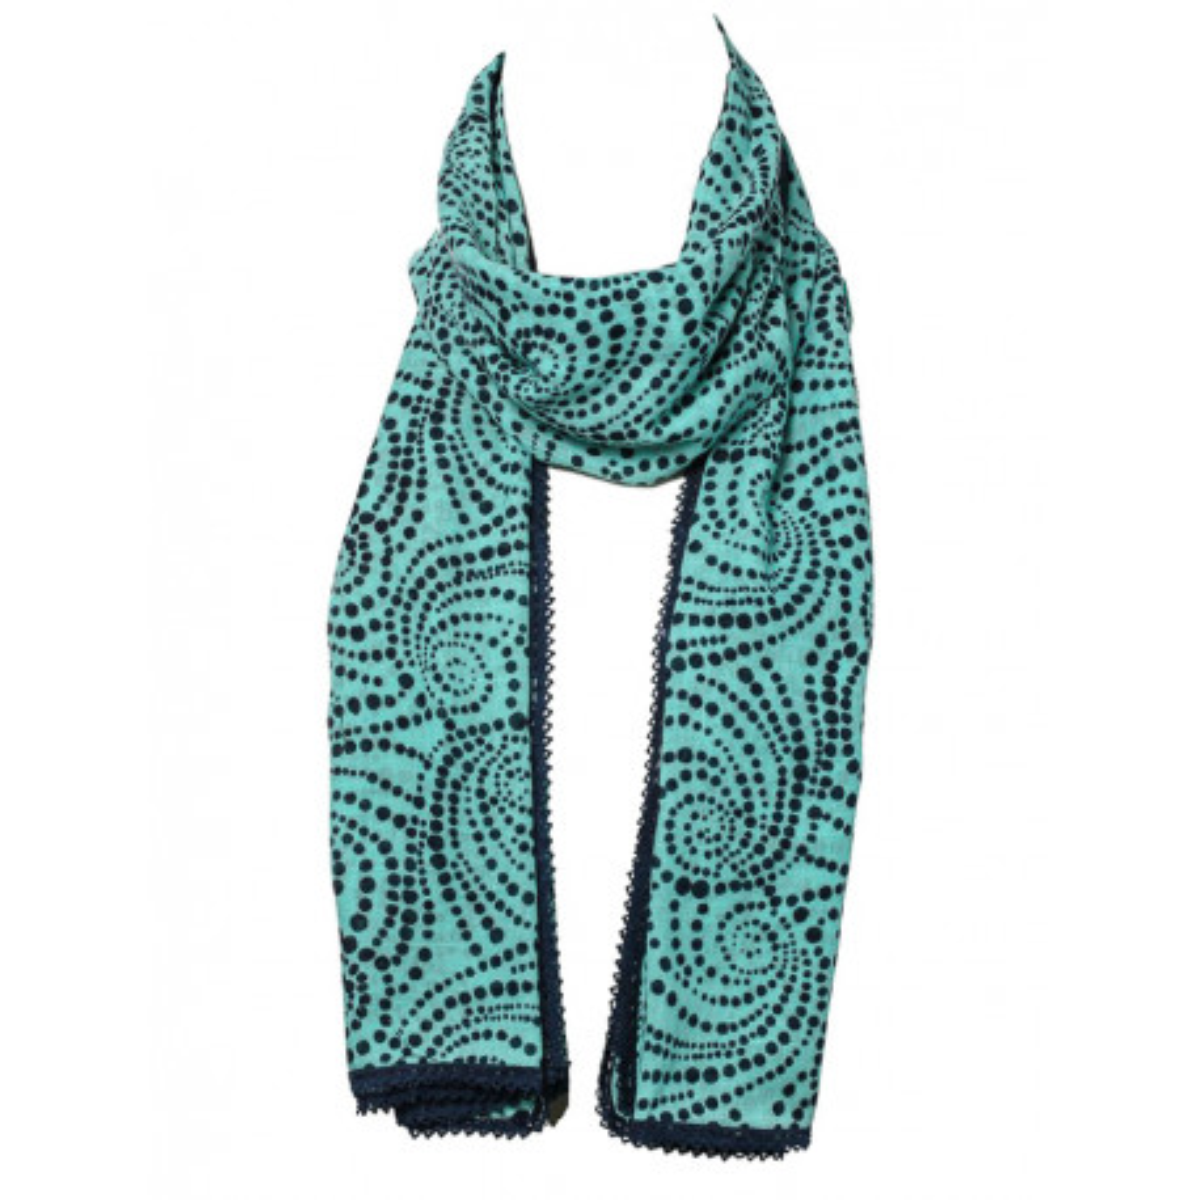 Chèche foulard femme coton vert